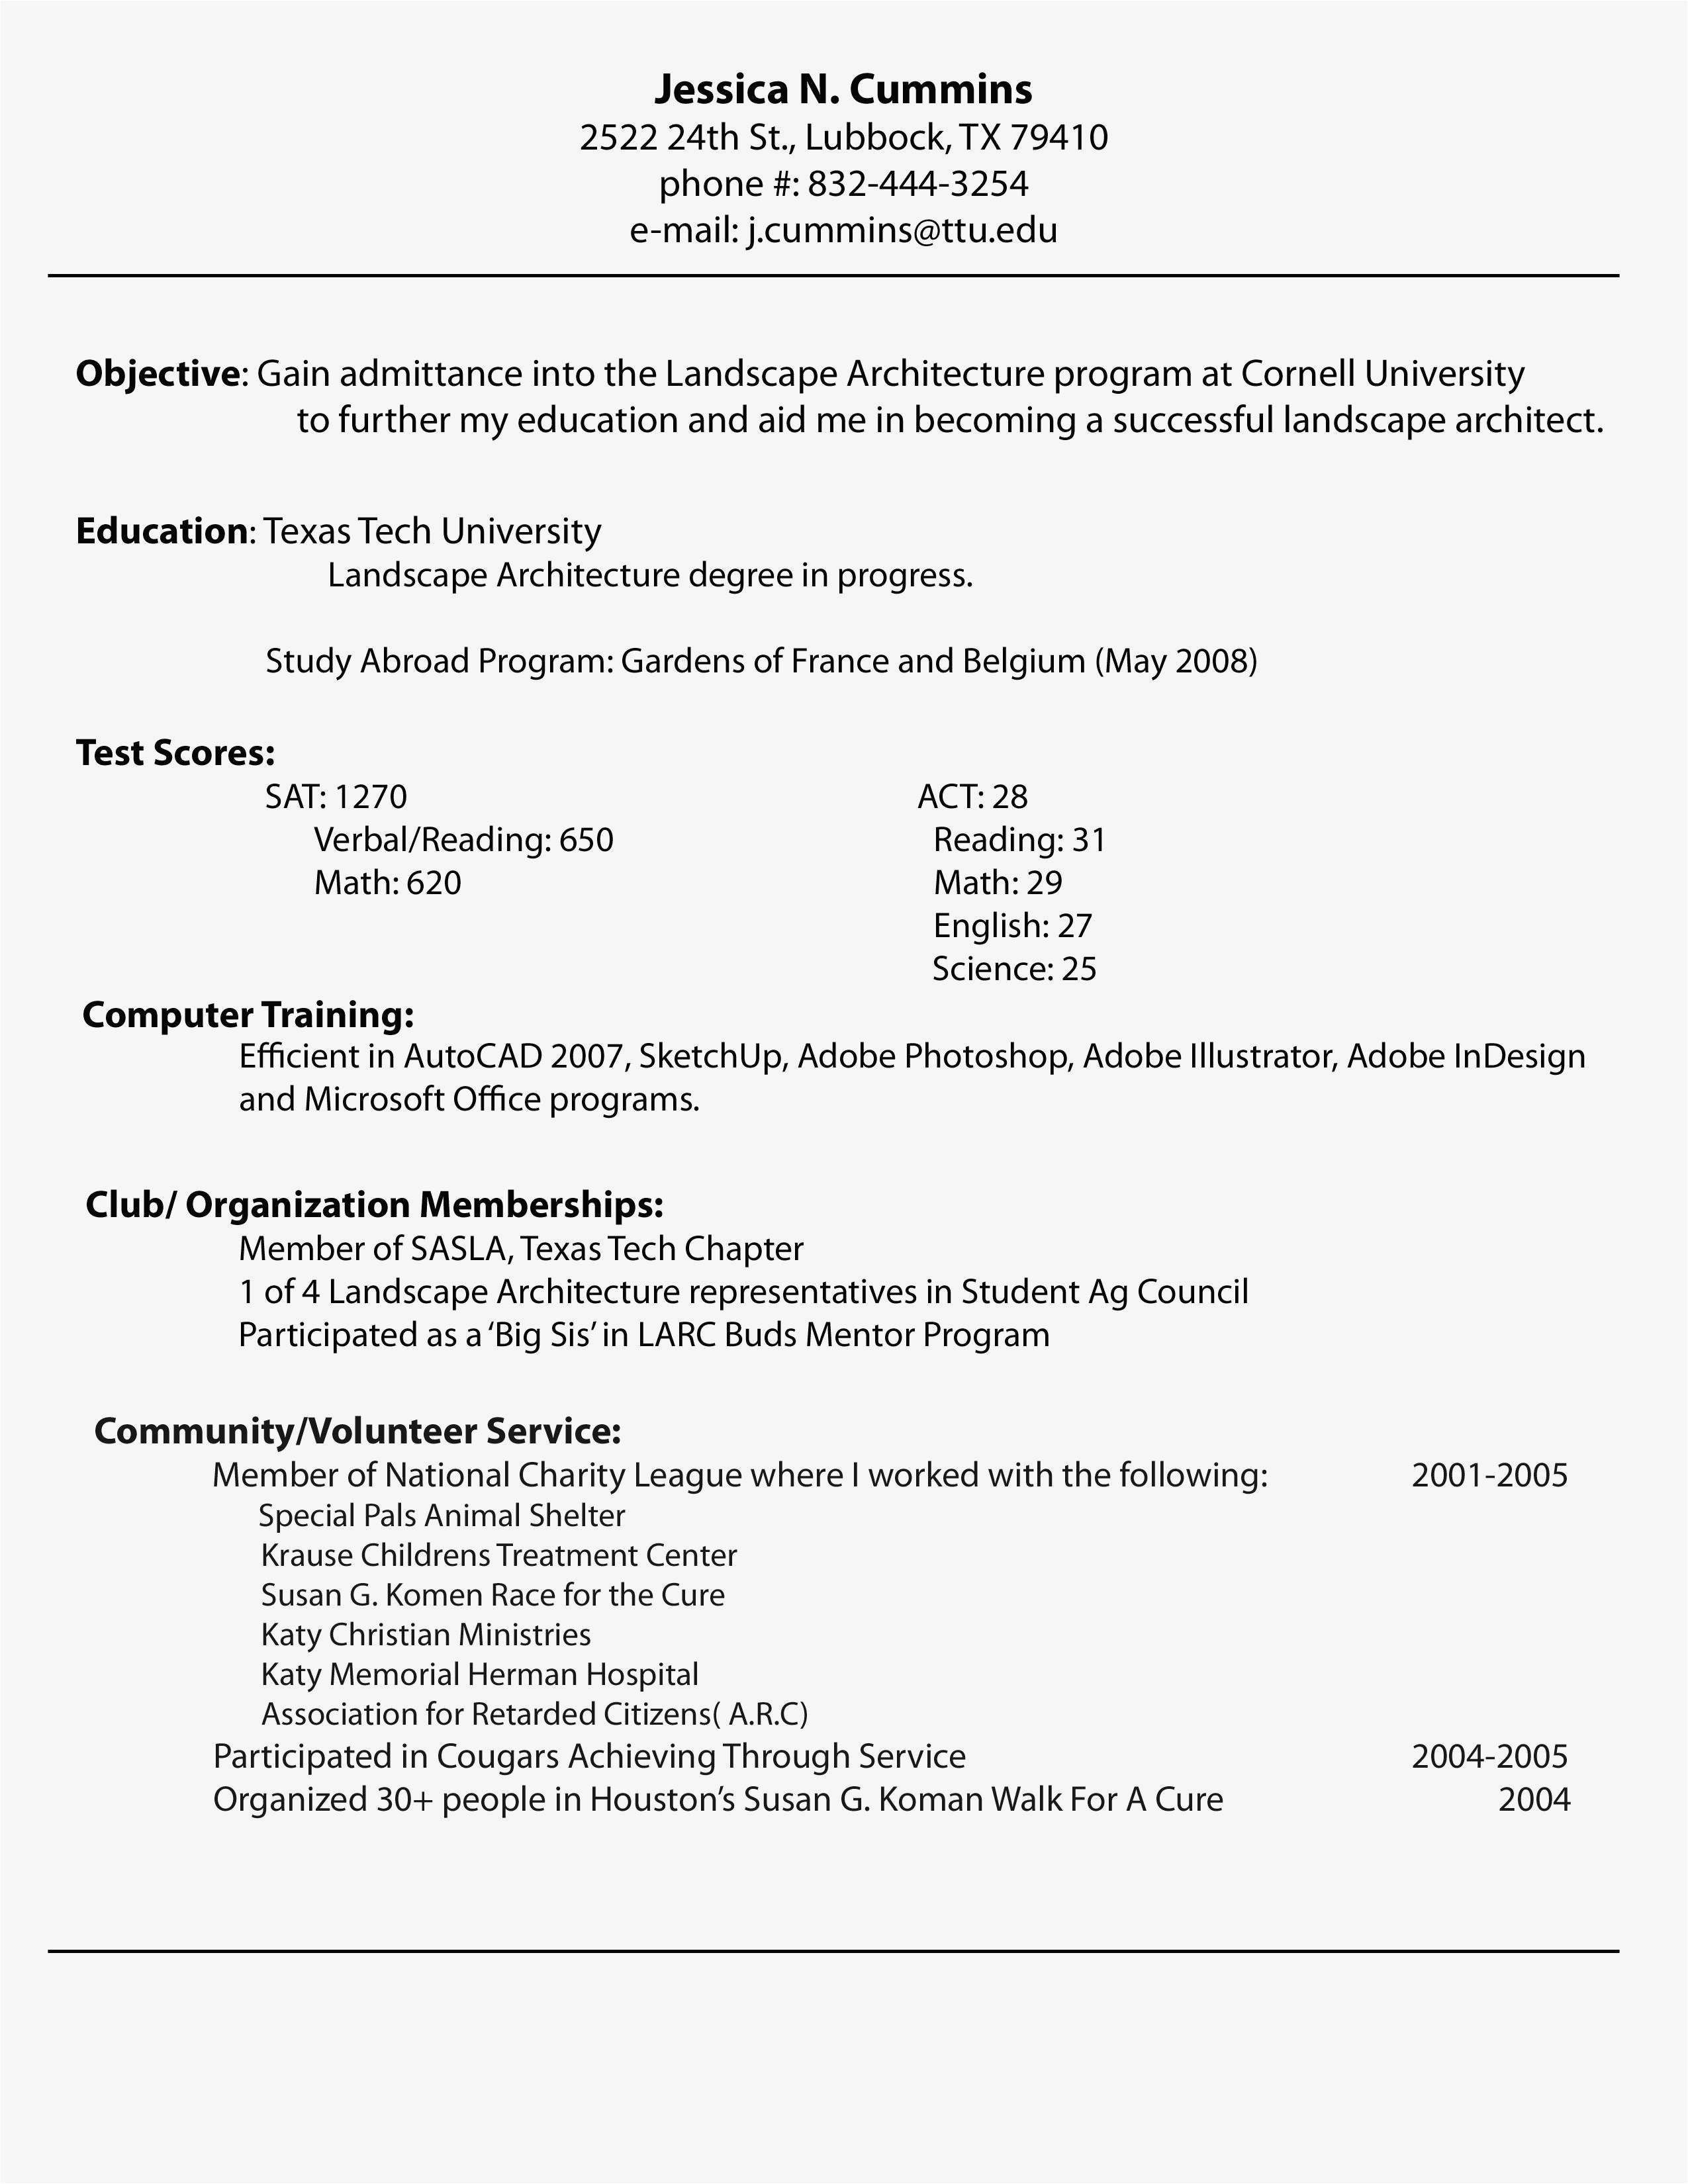 Visual Resume for Freshers Visual resume, Curriculum